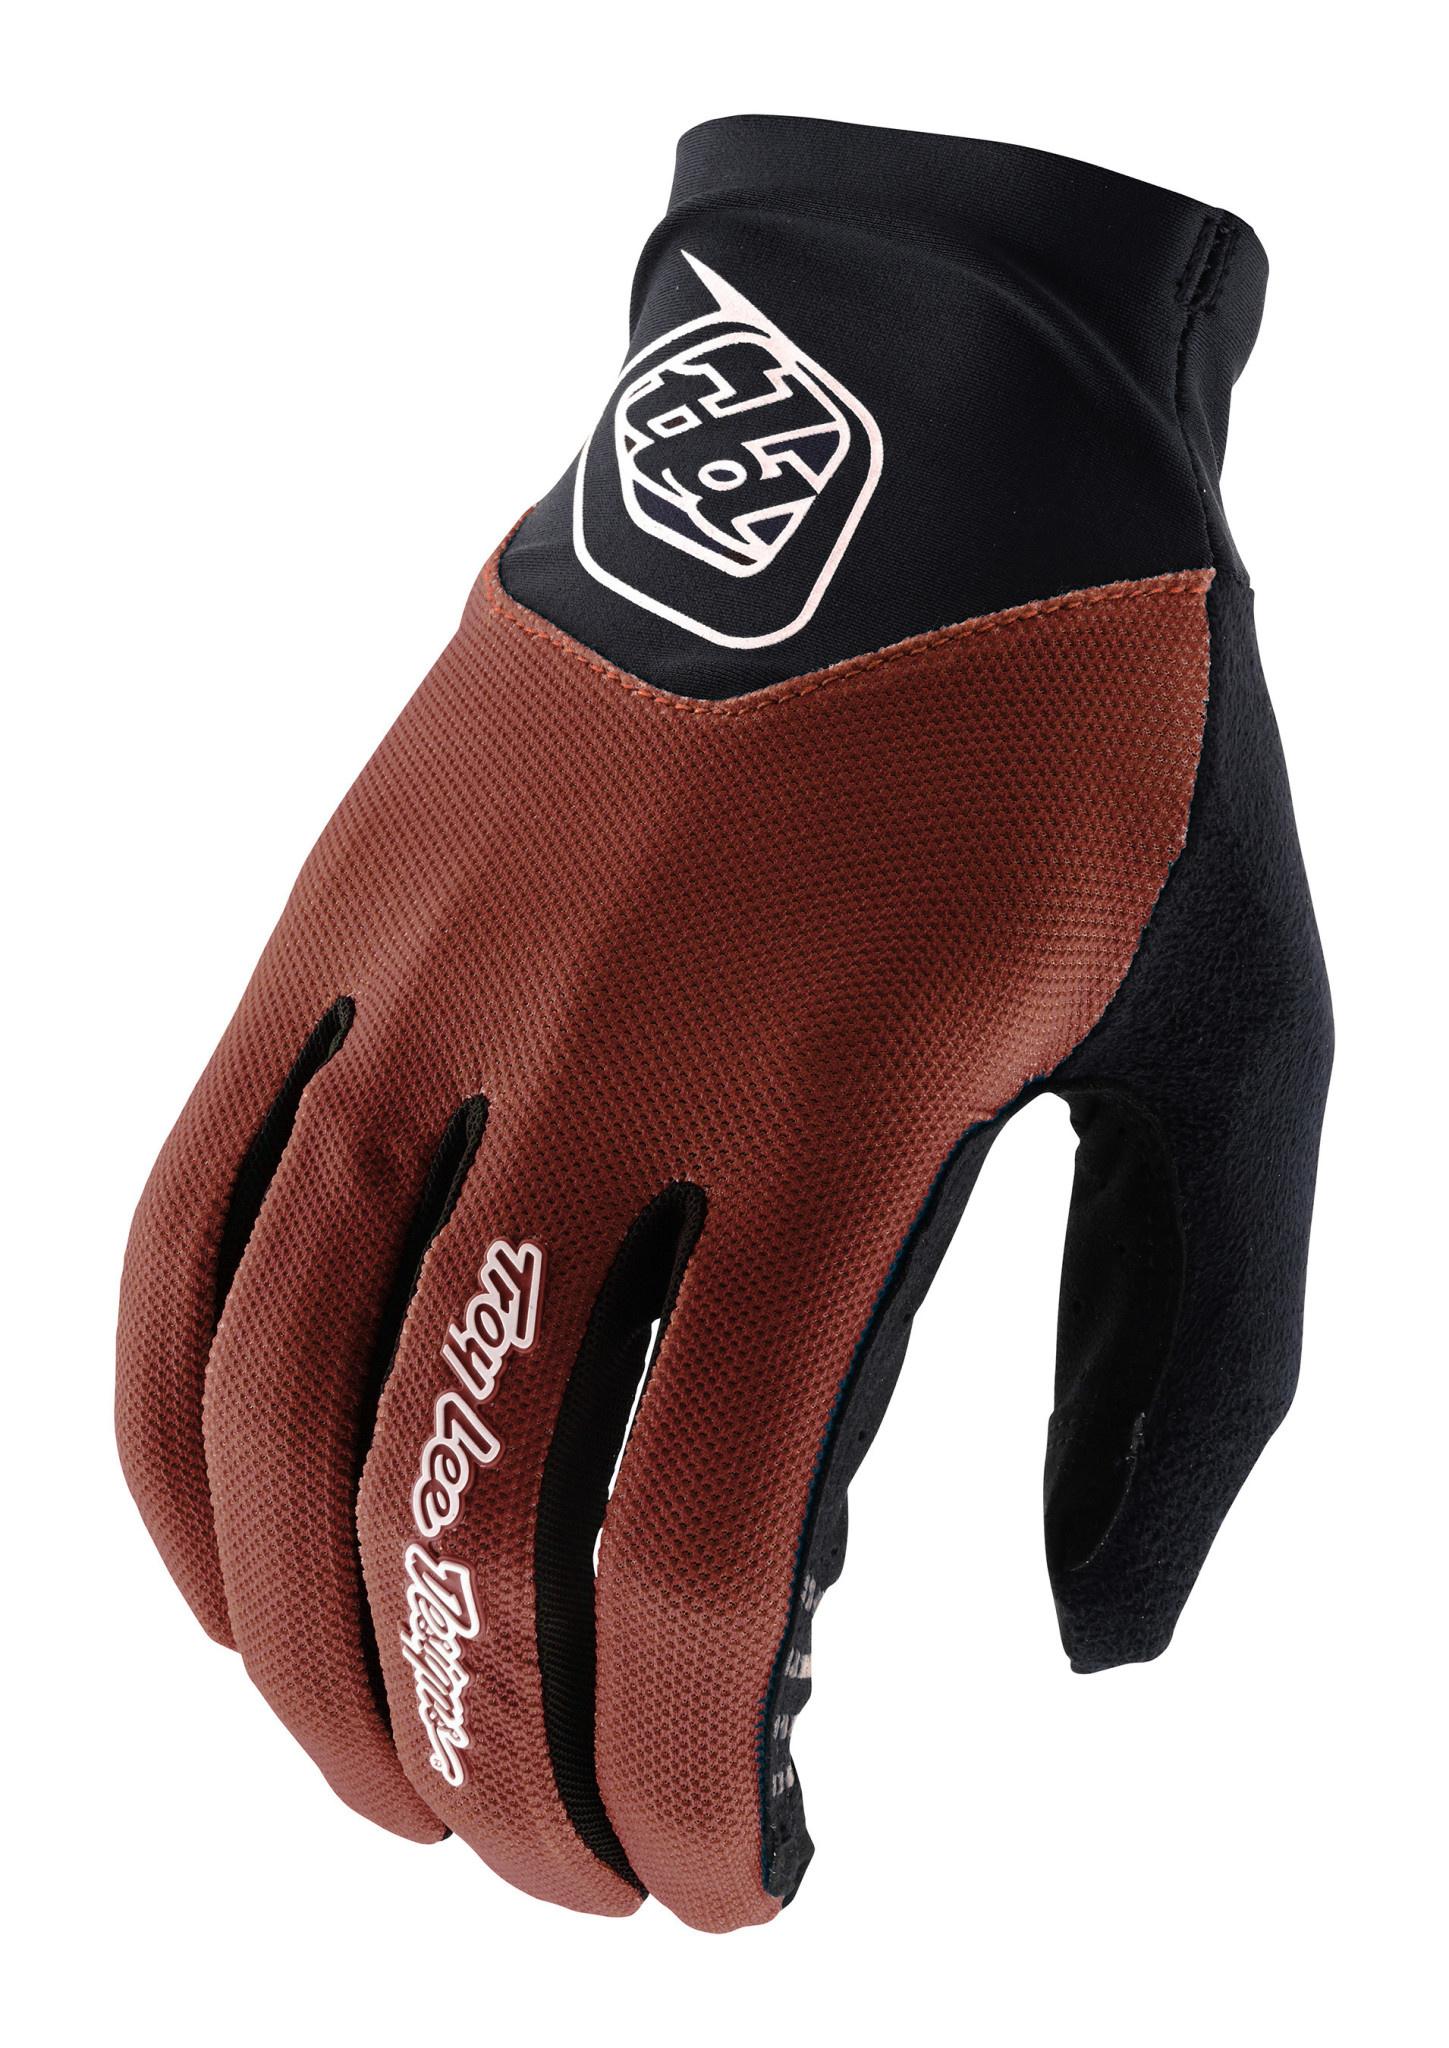 Ace 2.0 Gloves